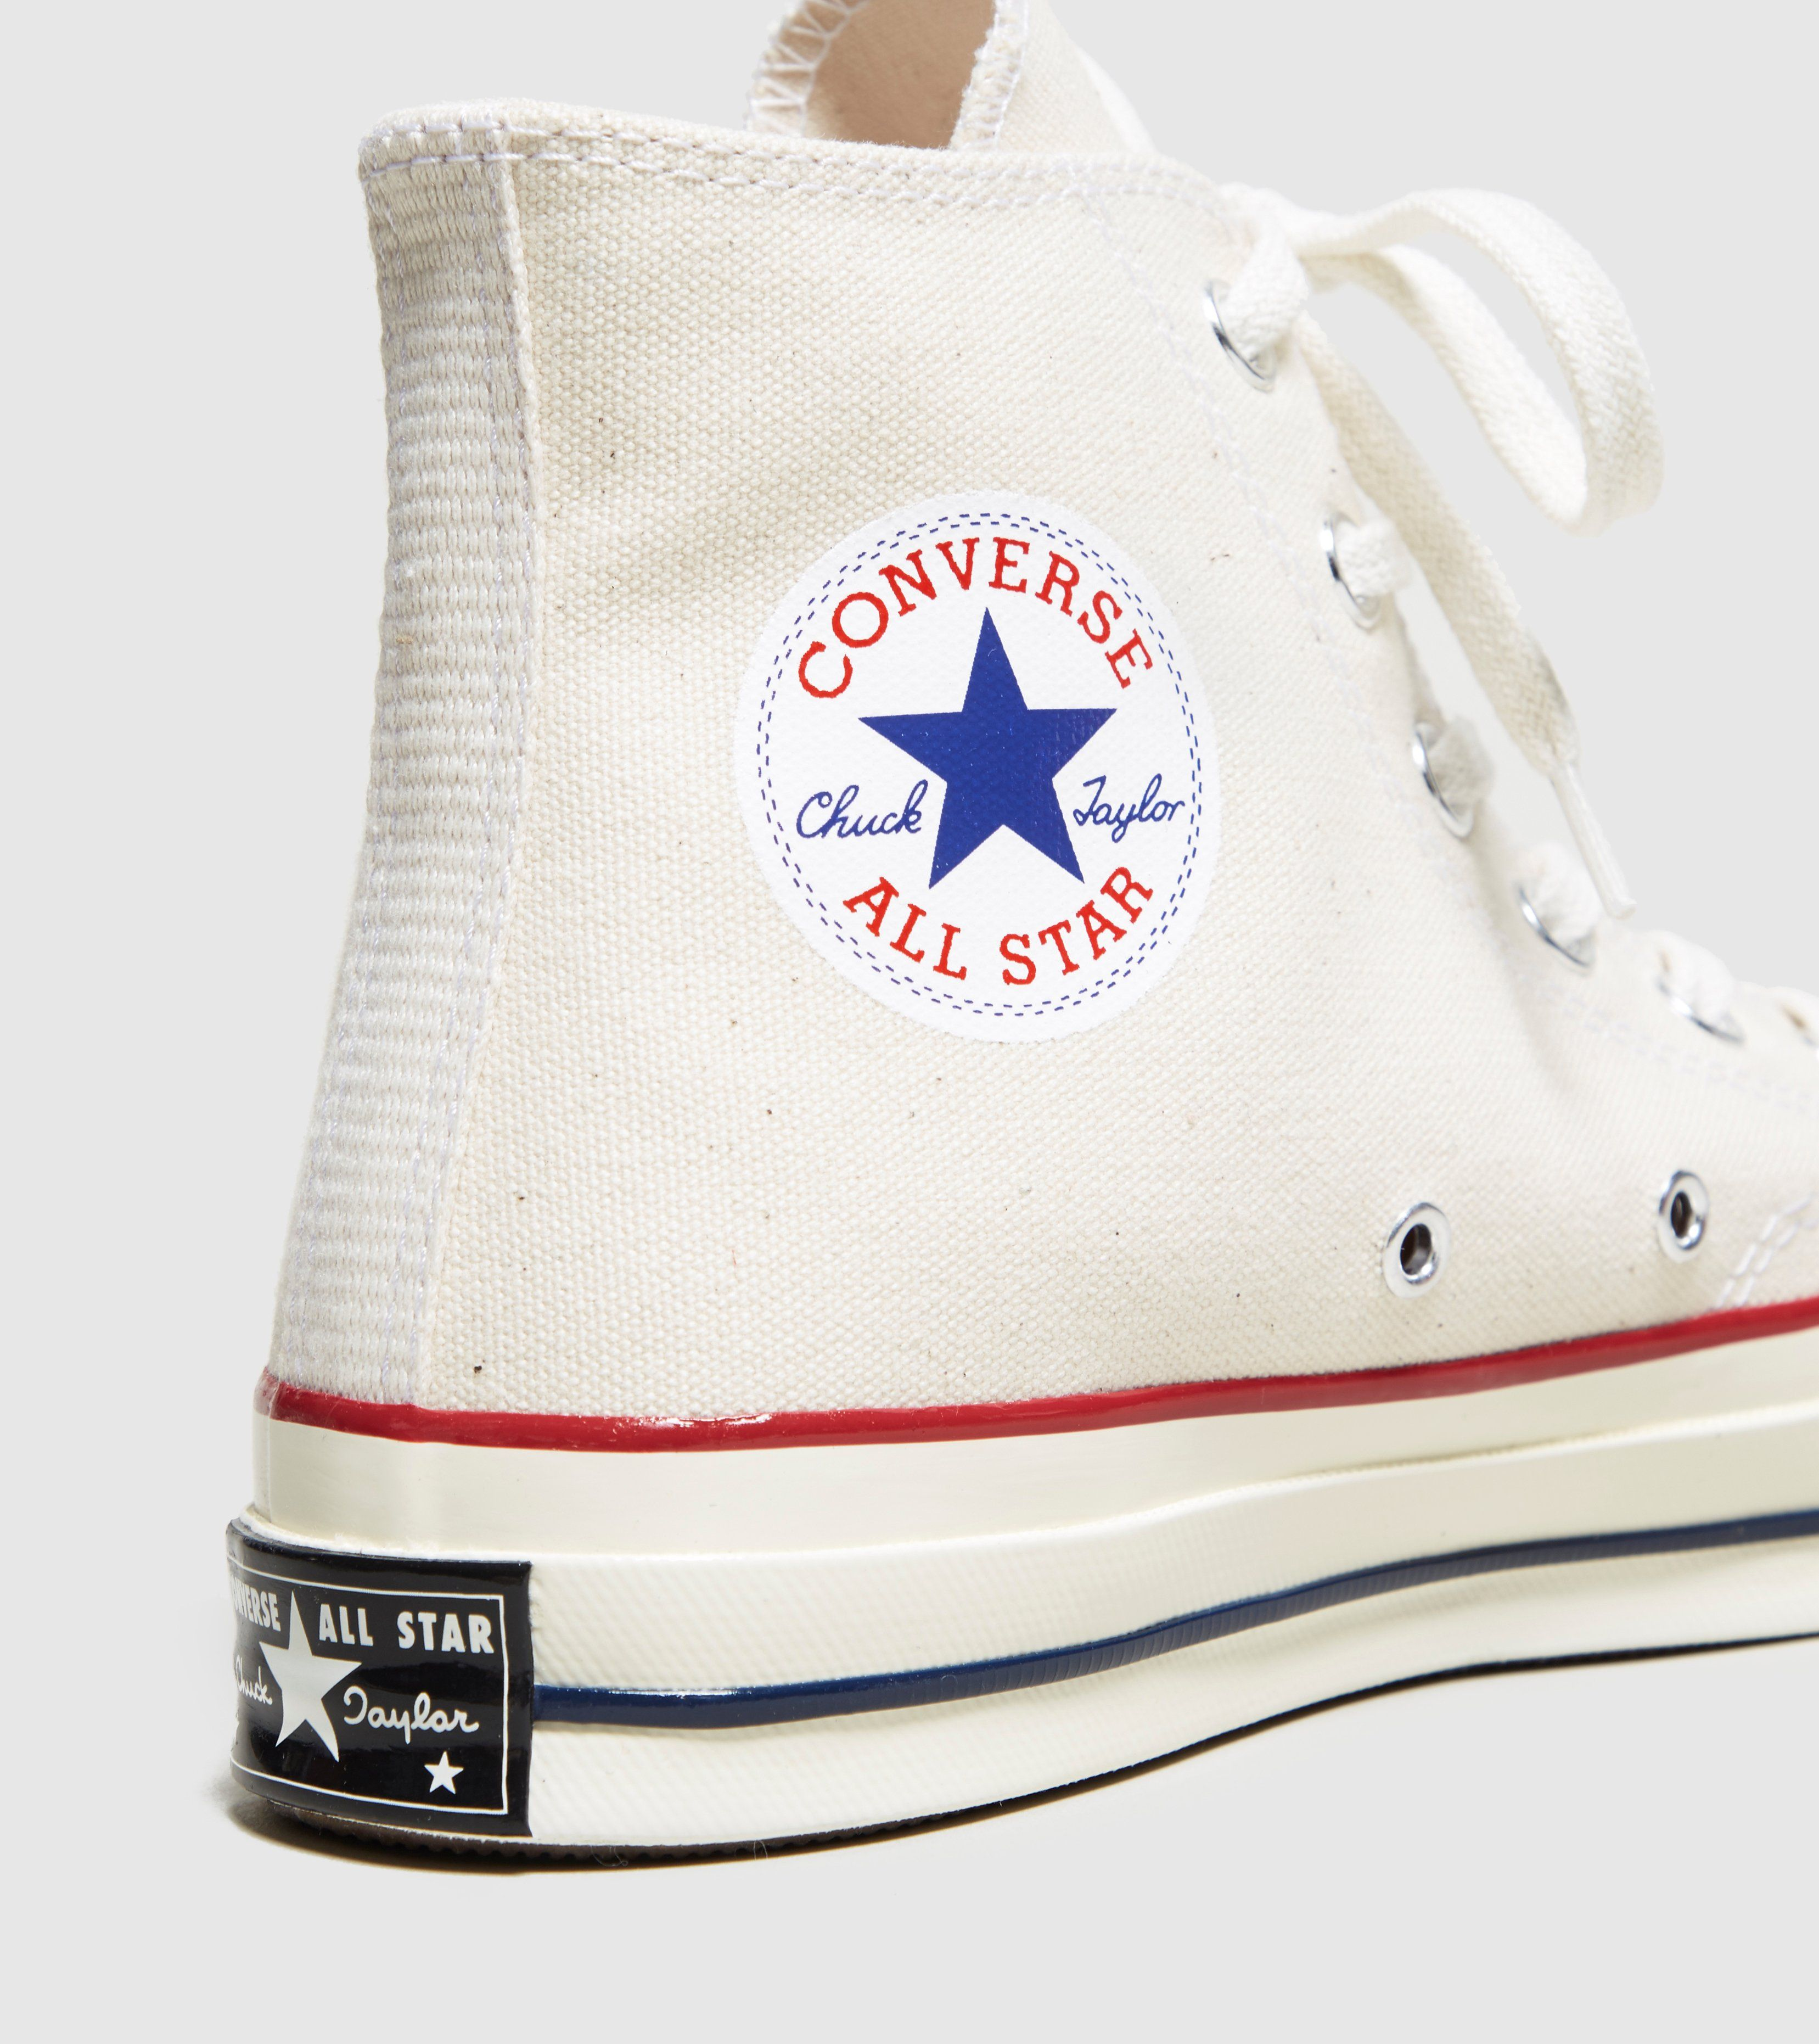 Converse Chuck Taylor All Star '70 Hi Women's